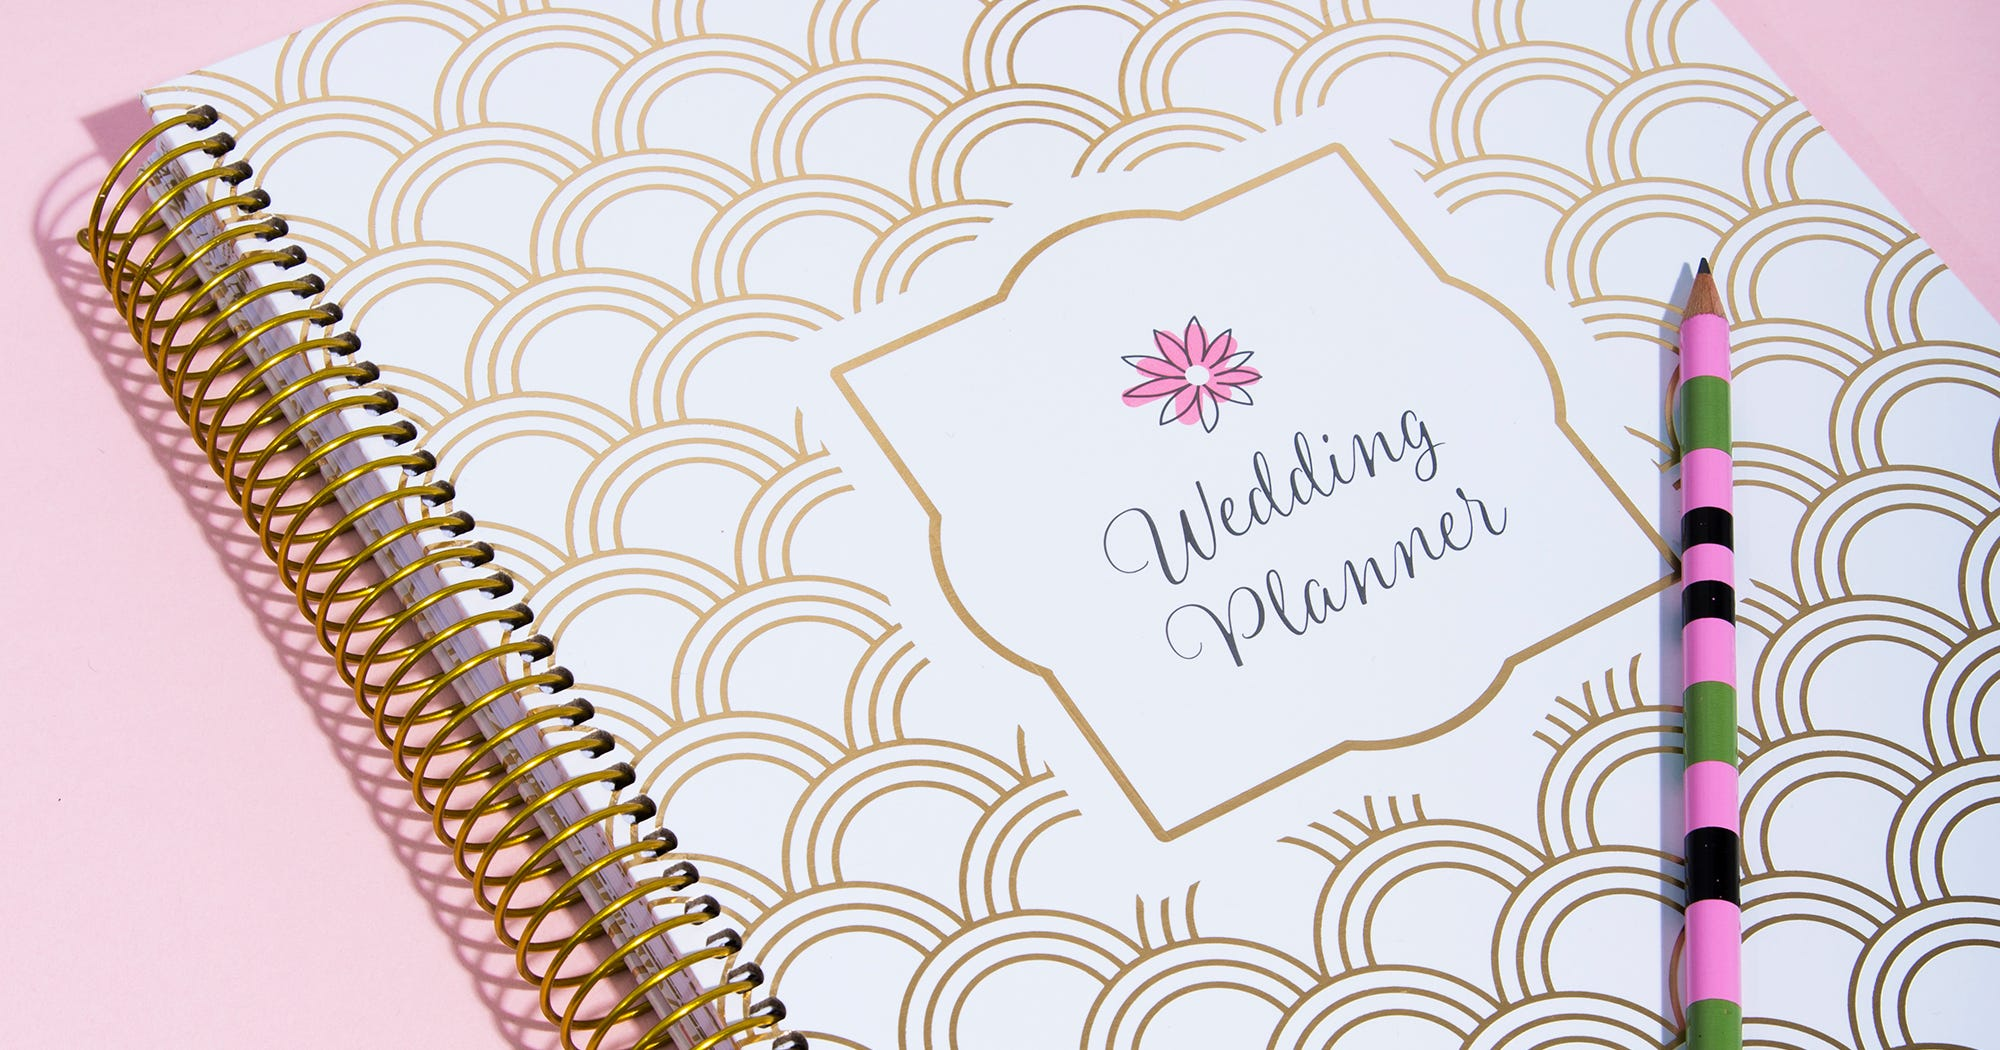 reddit uk personal finance - best wedding planning advice reddit thread